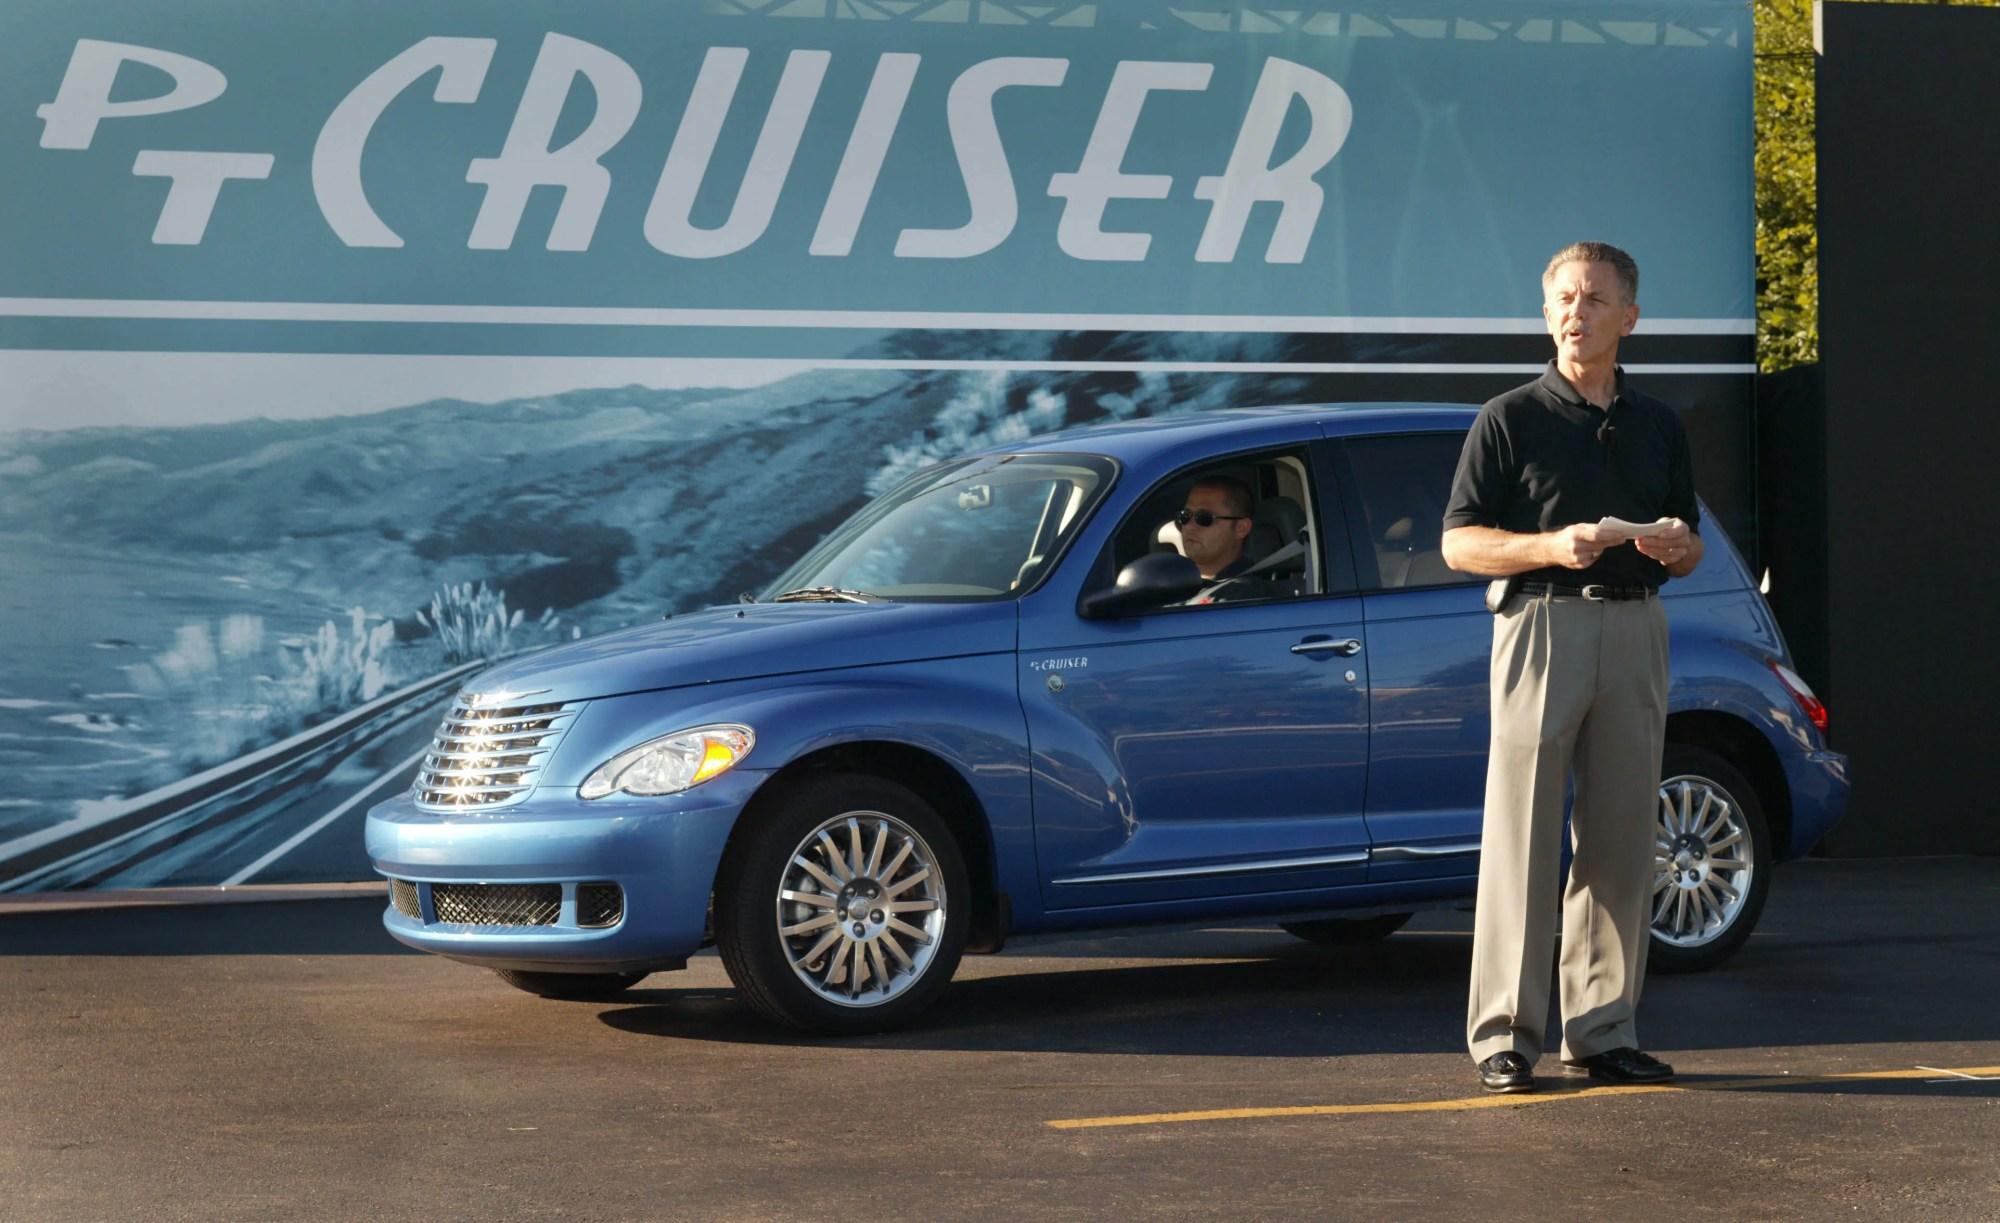 hight resolution of 2007 chrysler pt street cruiser pacific coast highway edition top speed